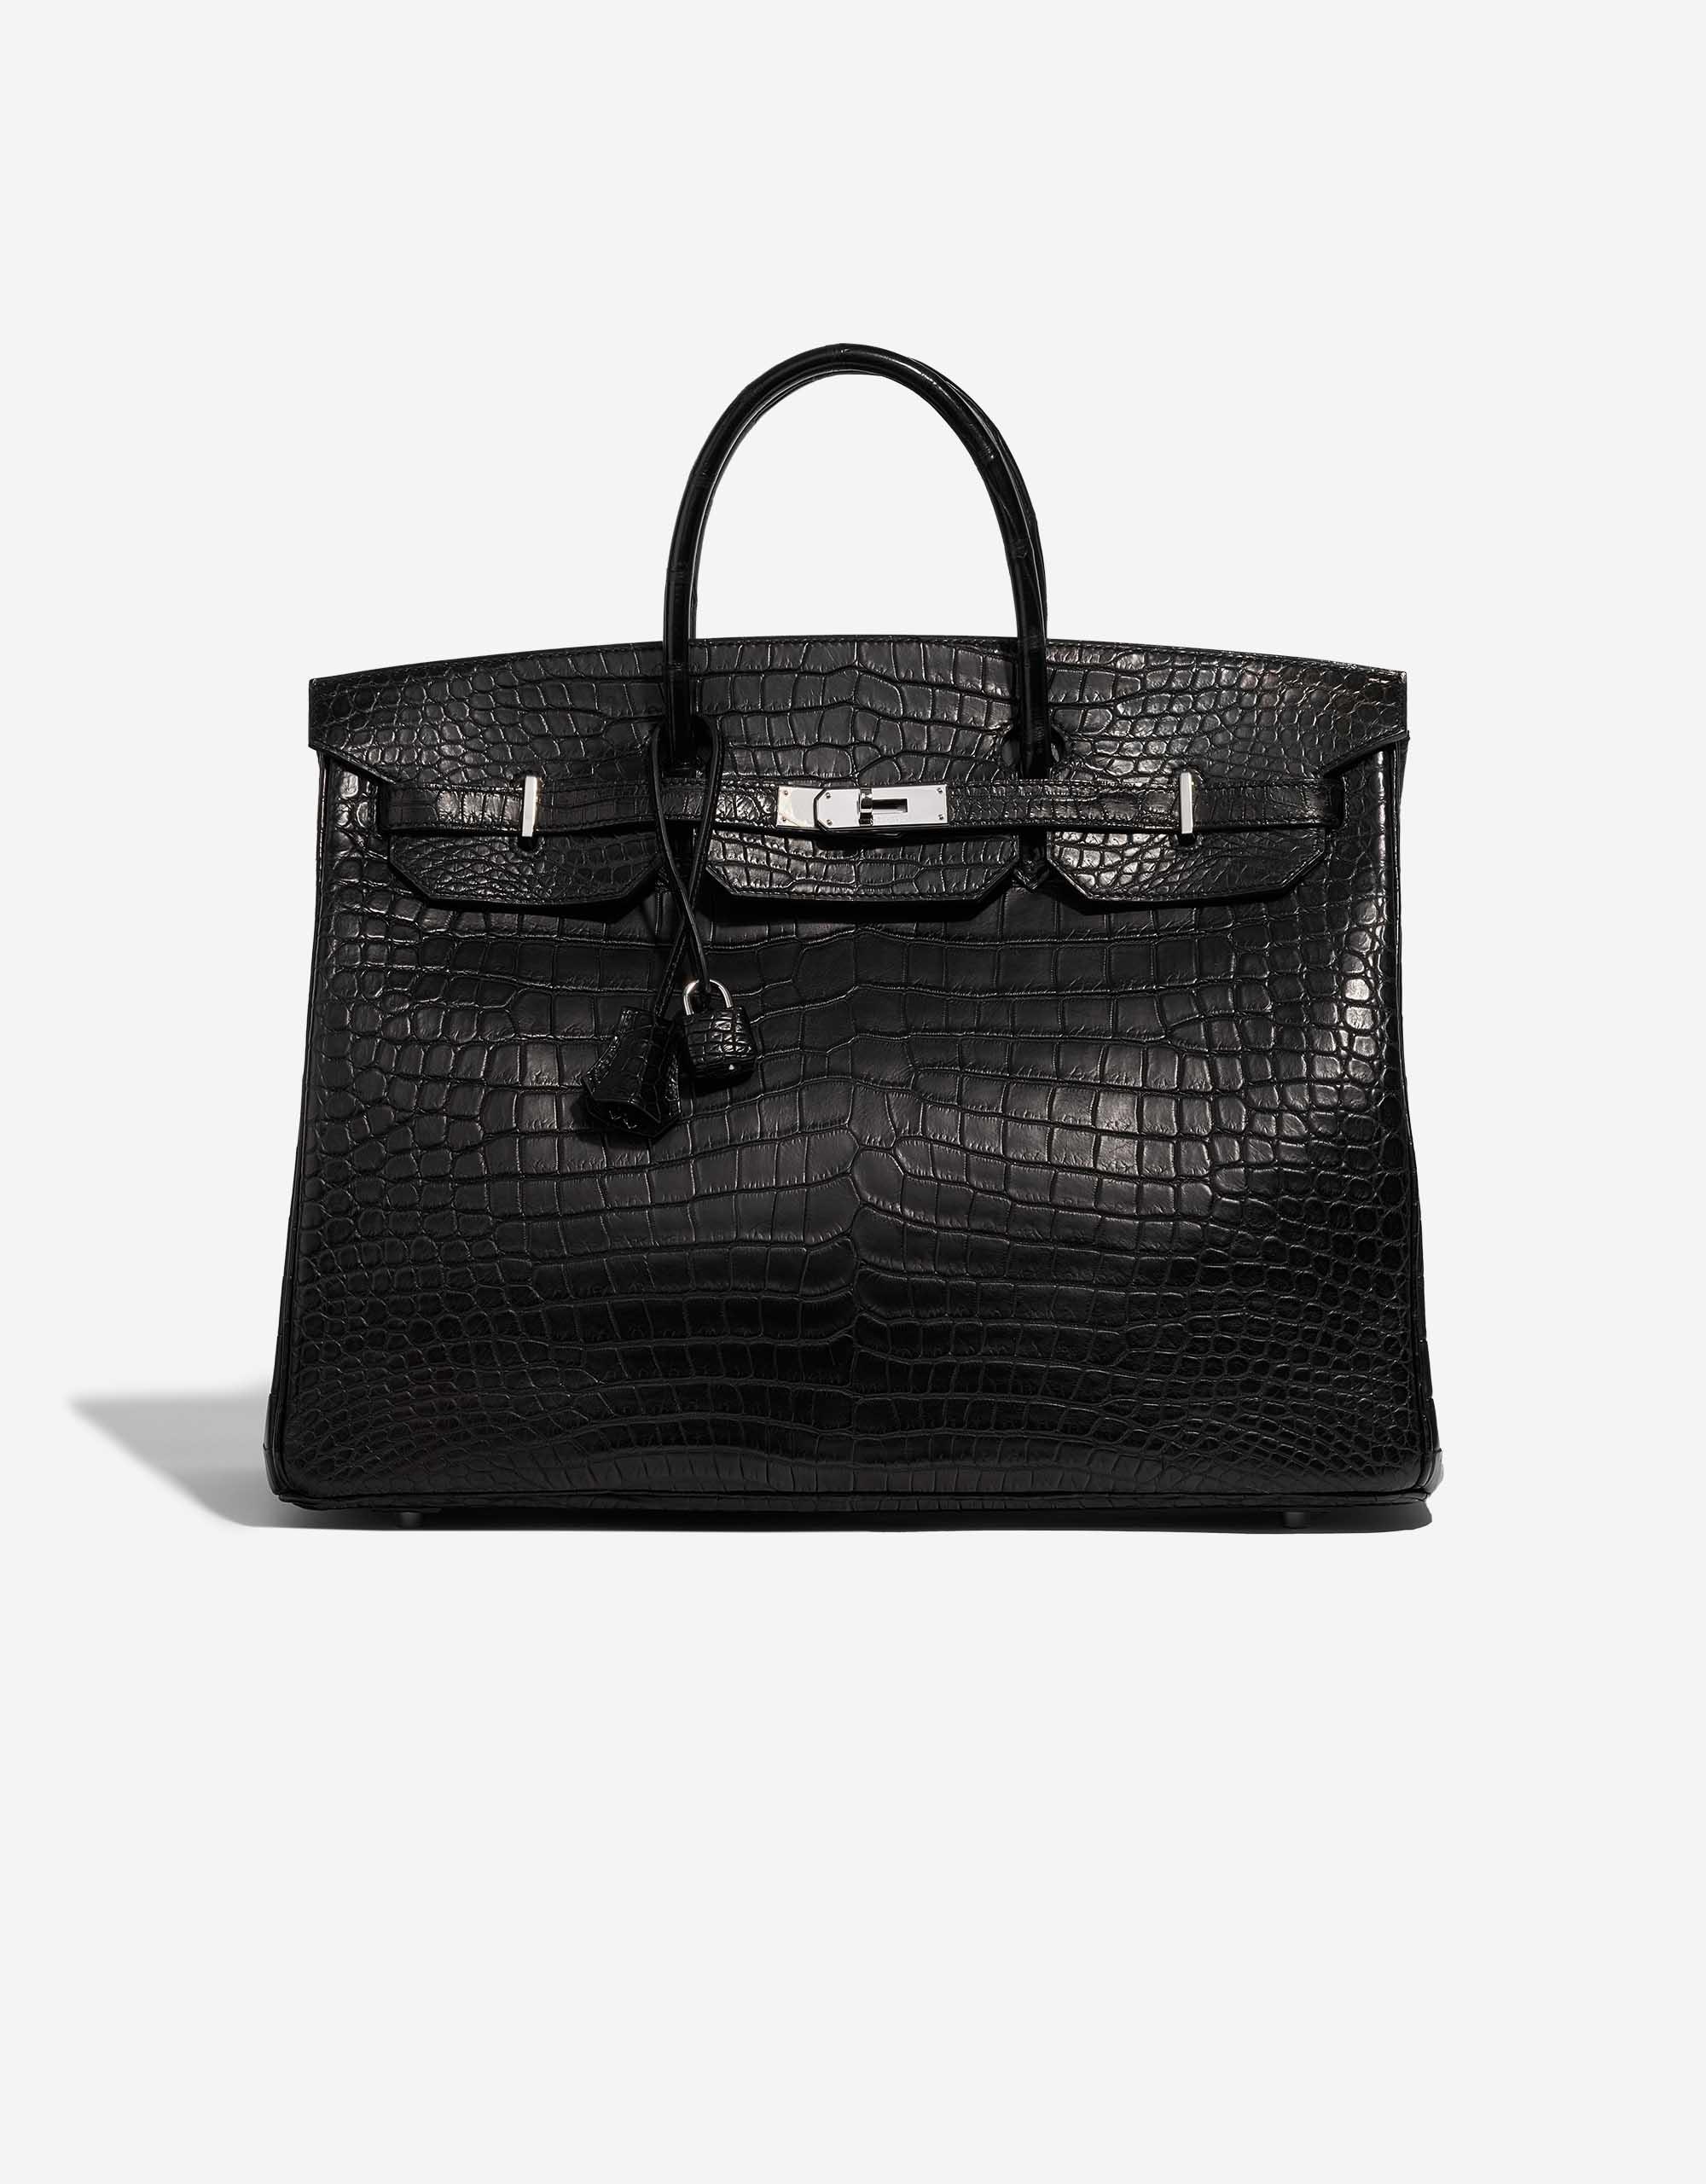 Hermès Birkin 40 Matte Porosus Crocodile Black | SACLÀB